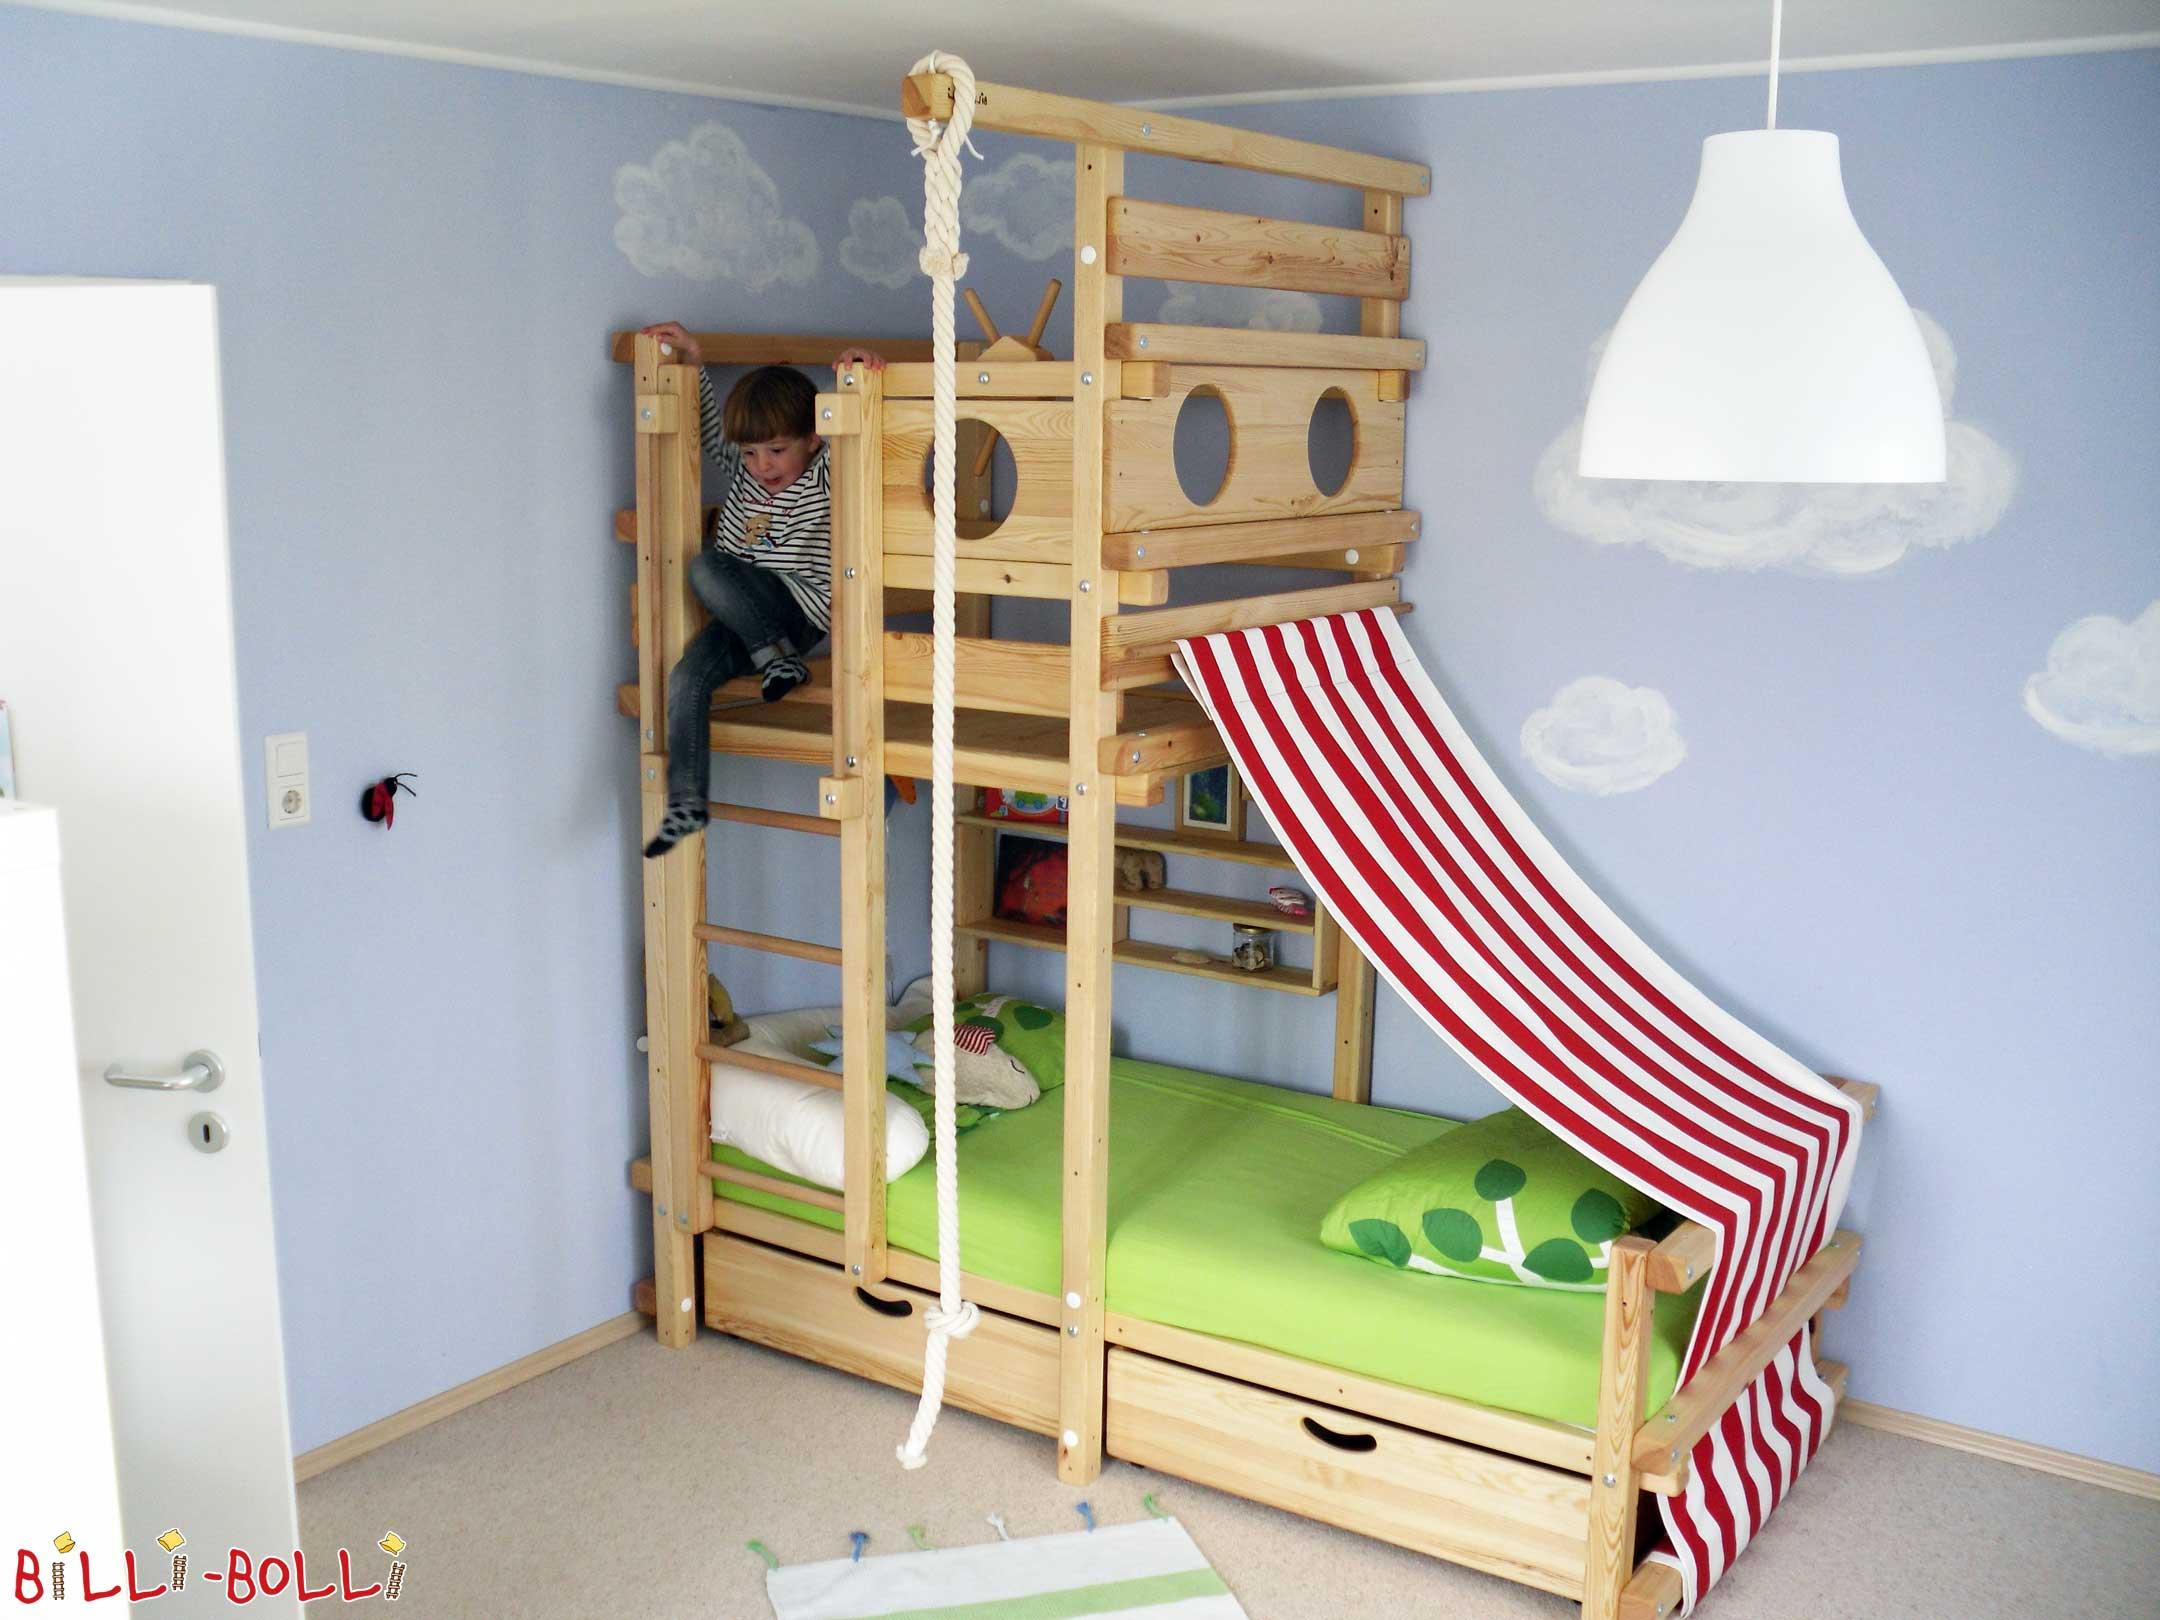 dachschr genbett billi bolli kinderm bel. Black Bedroom Furniture Sets. Home Design Ideas